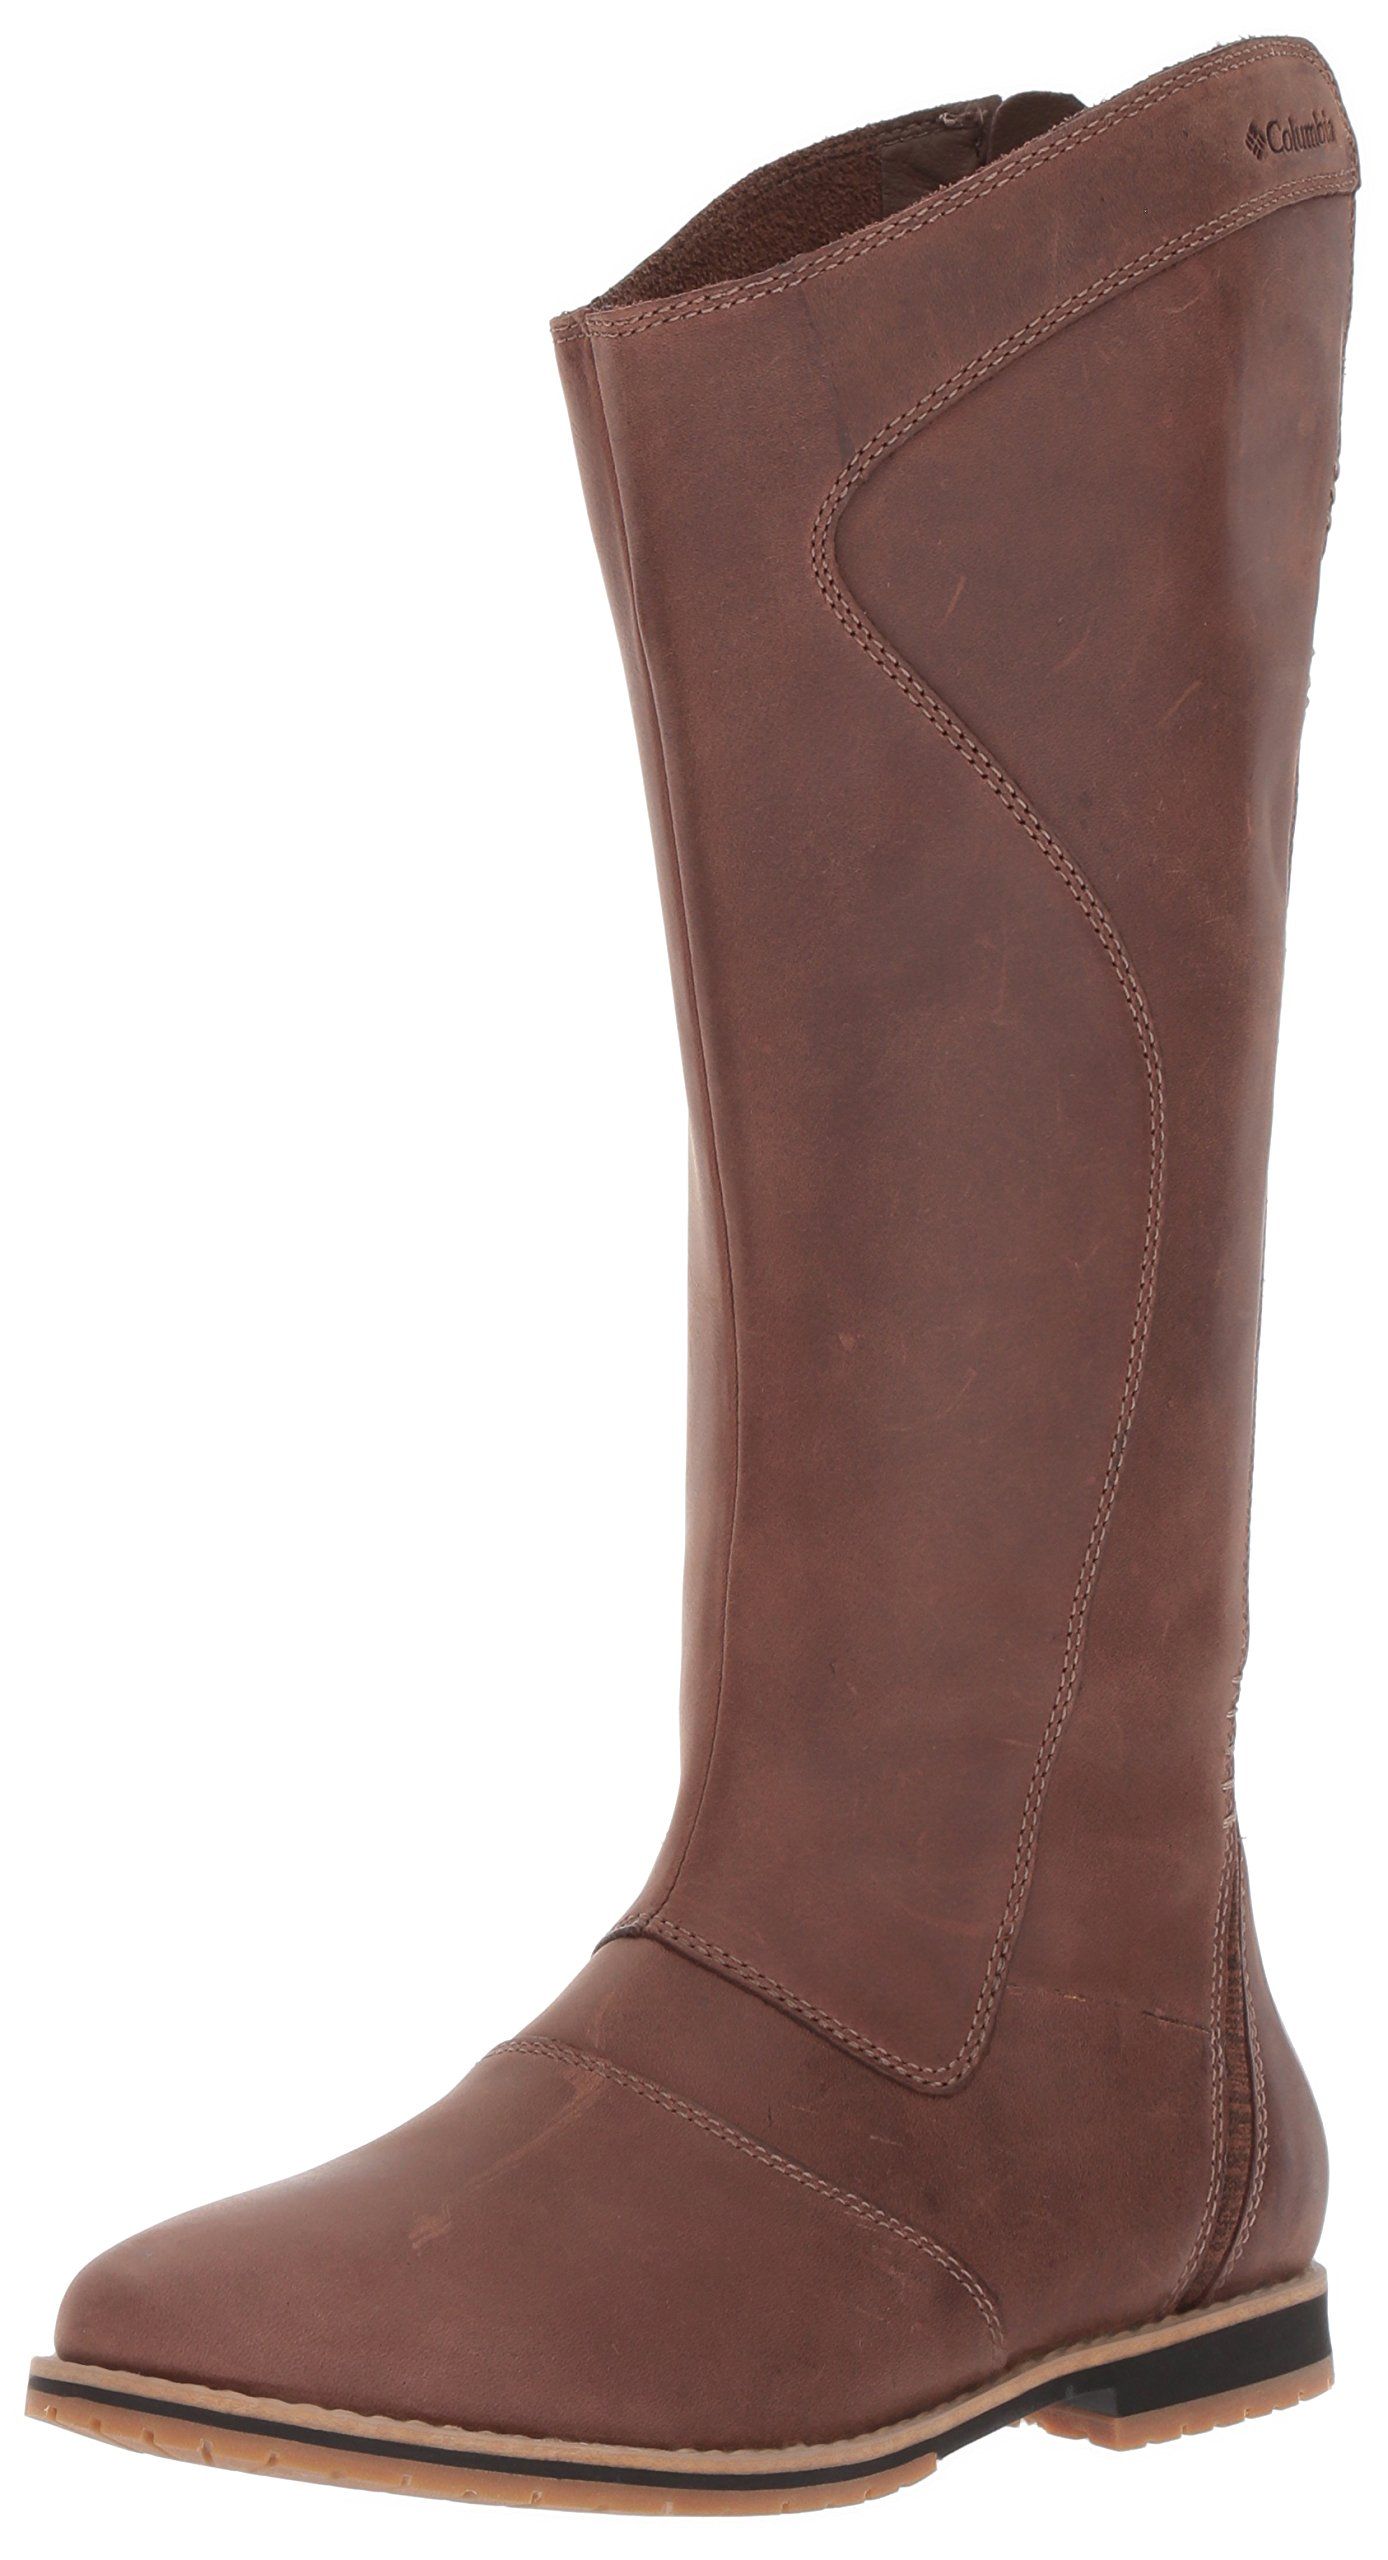 Columbia Women's Twentythird Ave Waterproof Tall Boot Uniform Dress Shoe, Tobacco, Oxford Tan, 6 B US